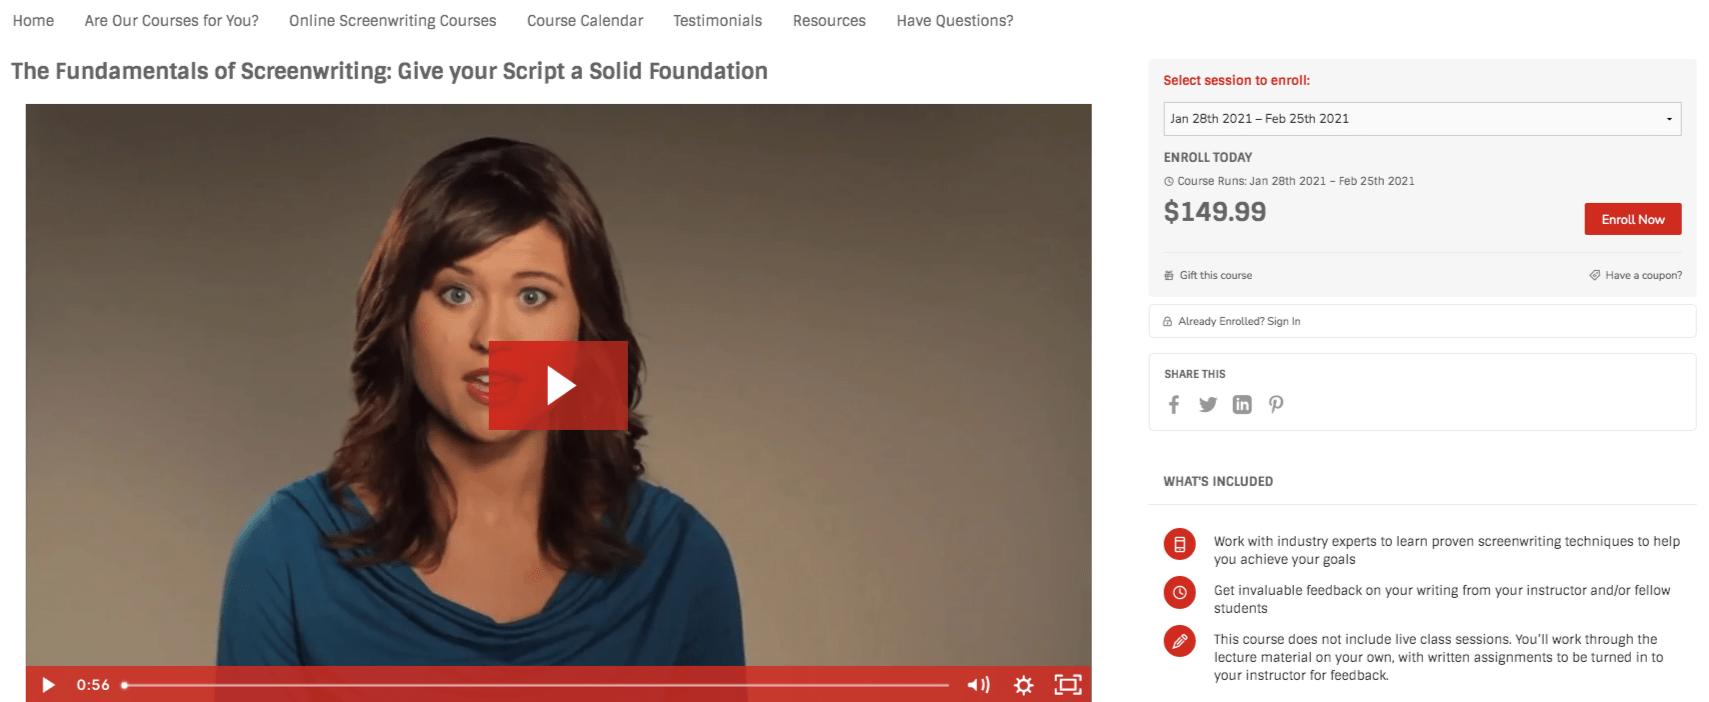 The Fundamentals of Screenwriting - Script University (Screenwriter University)